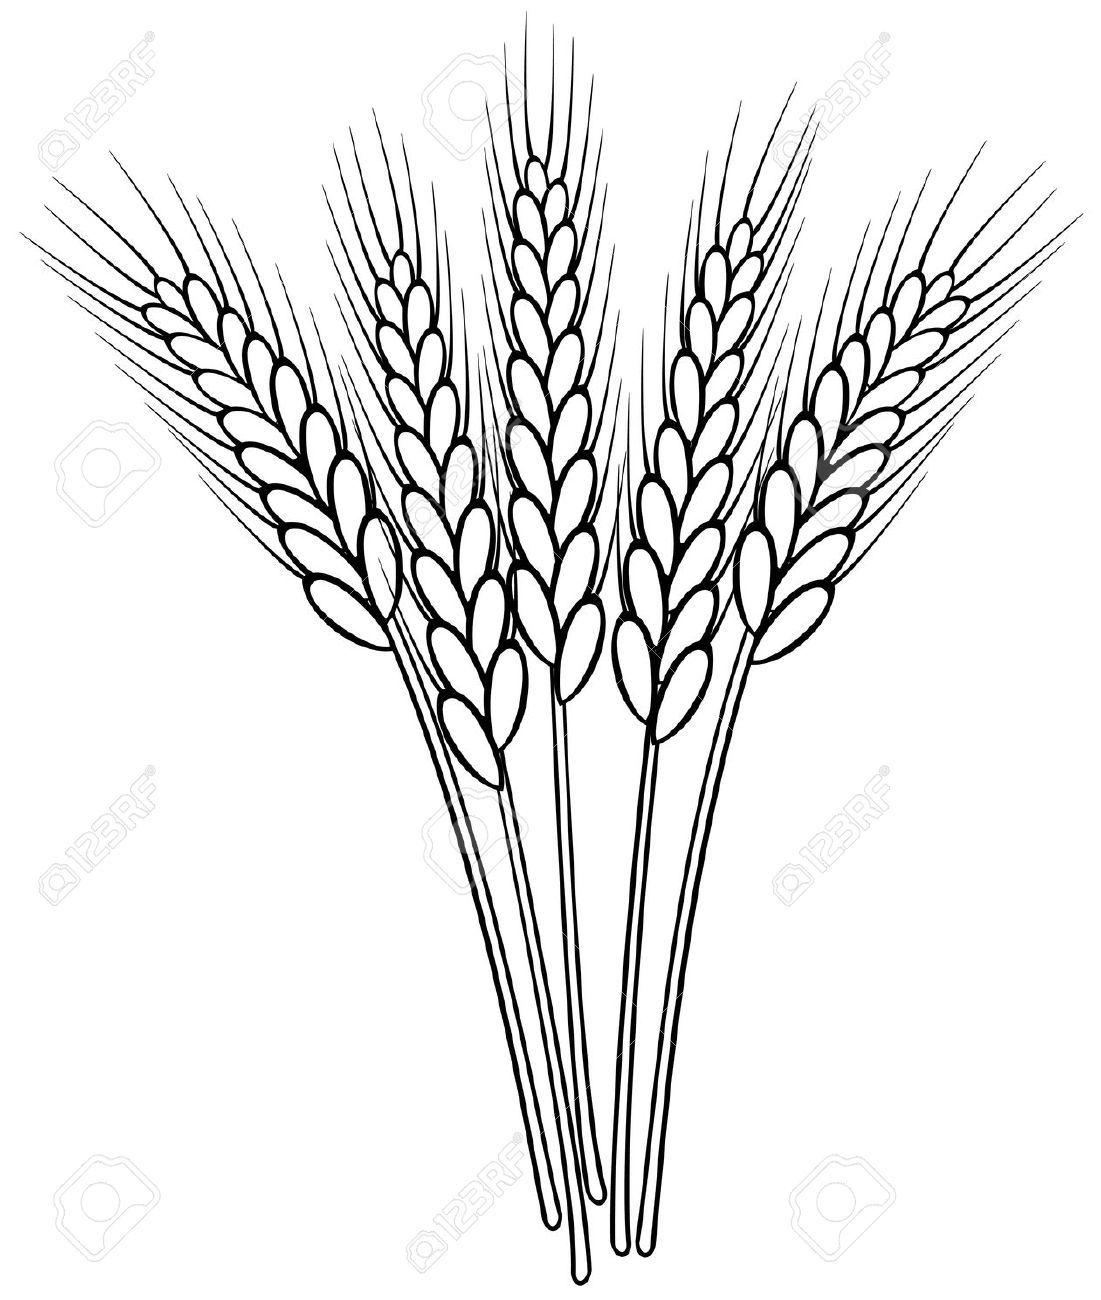 Small Wheat Sheaf Vector